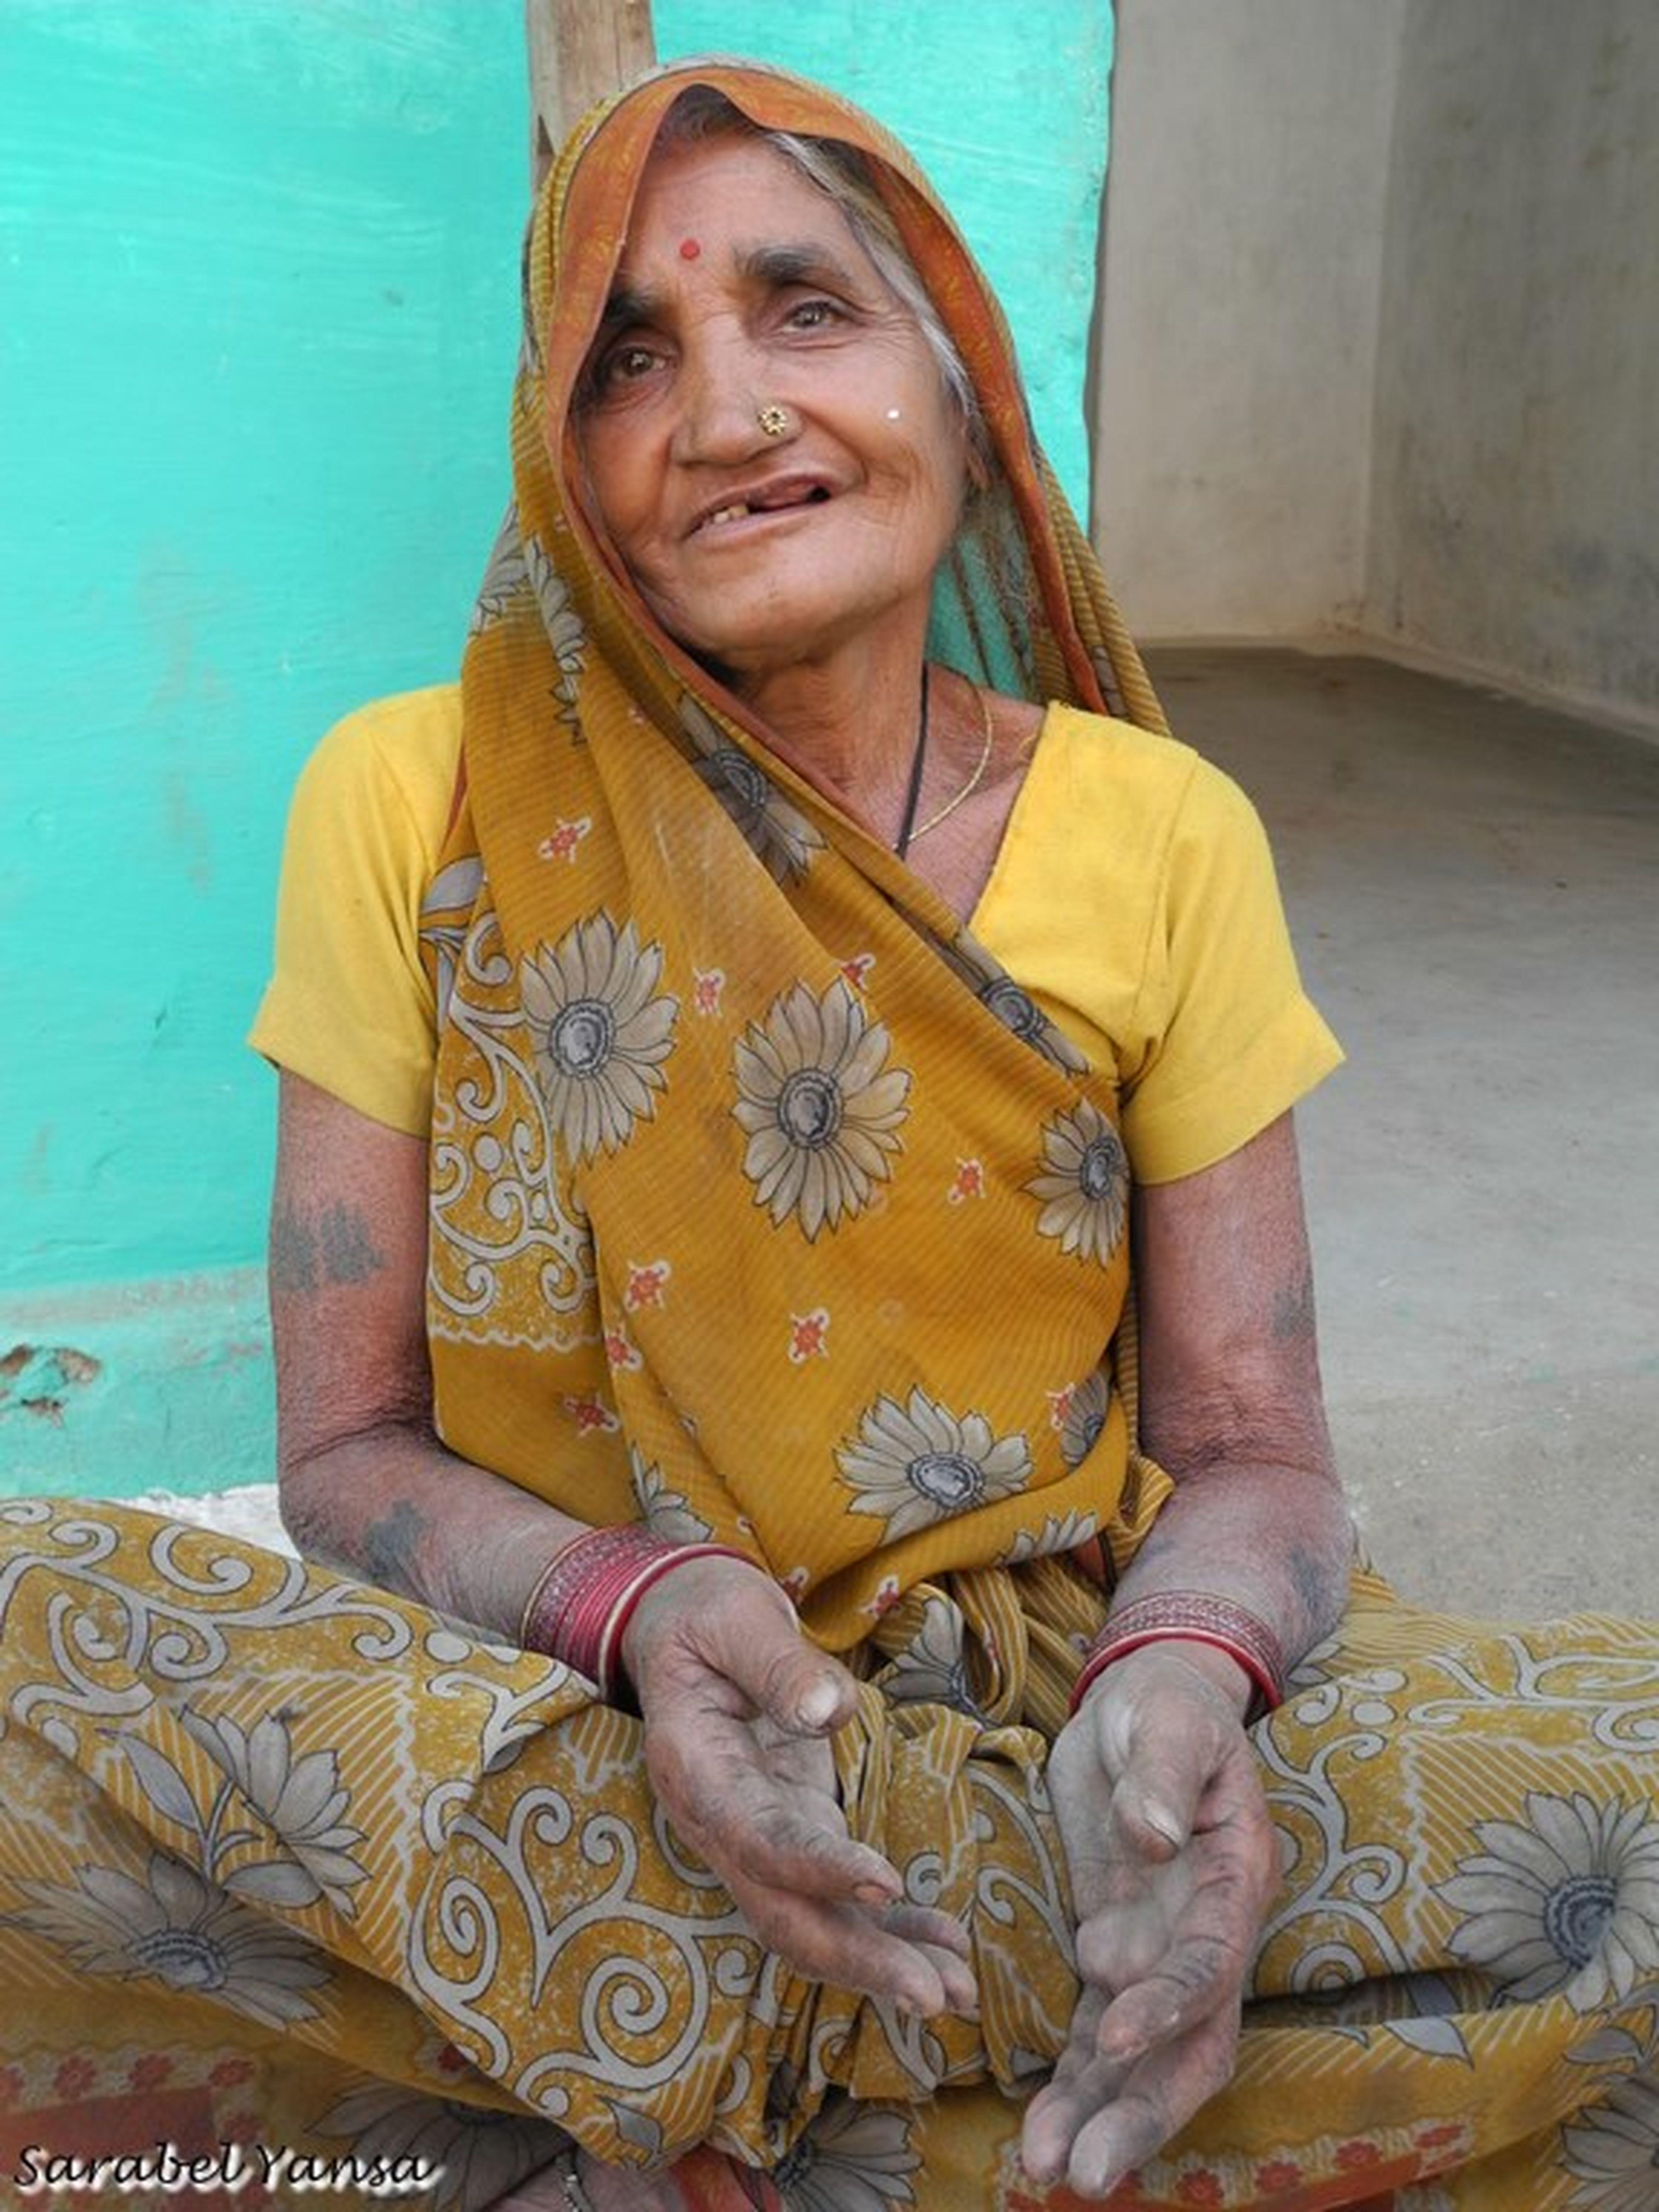 PerDiemTributeDay WorldPopulationDay DiaMundialDeLaPoblacion India